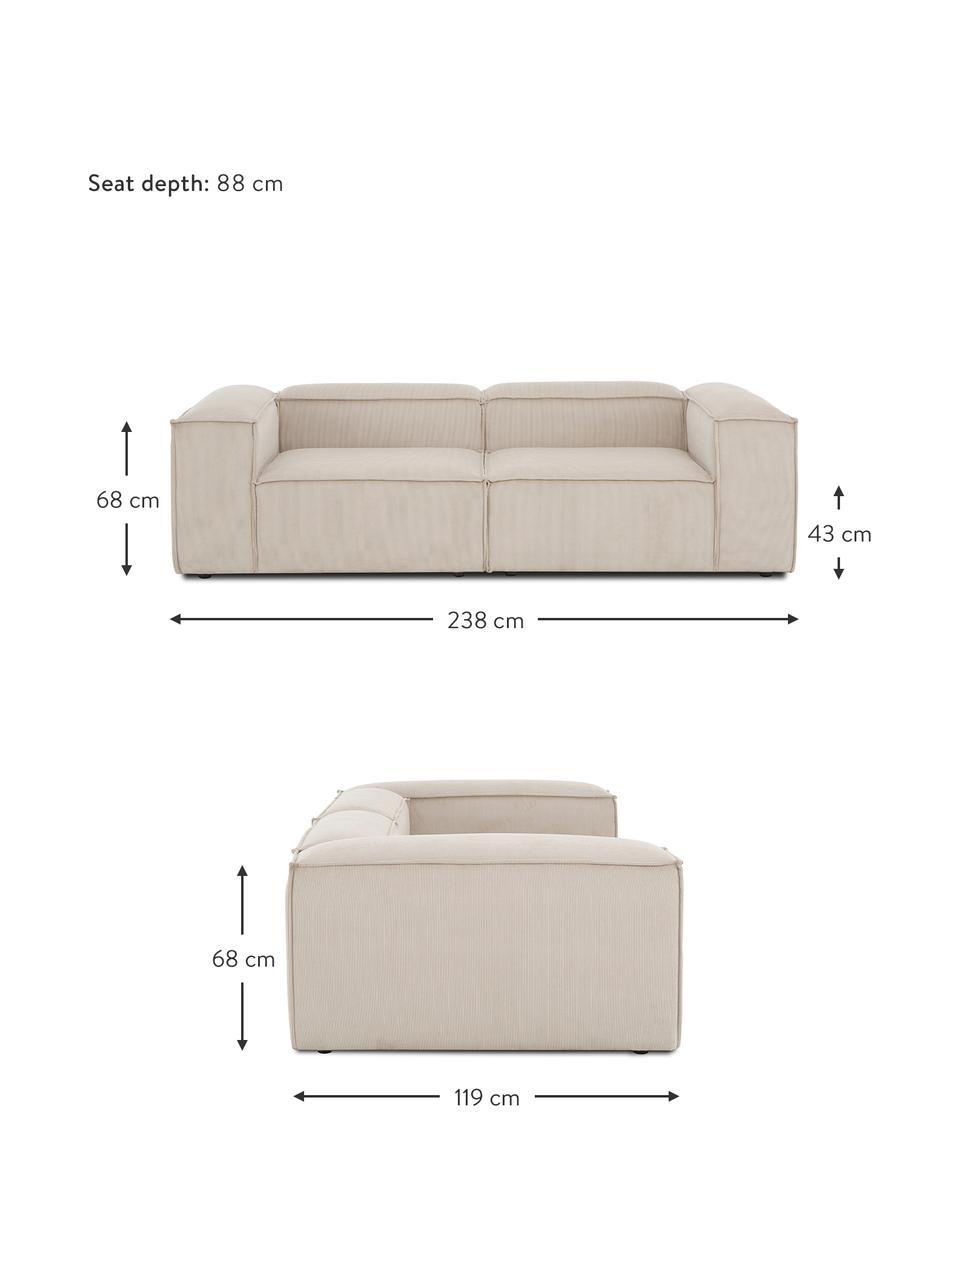 Modulares Sofa Lennon (3-Sitzer) in Beige aus Cord, Bezug: Cord (92% Polyester, 8% P, Gestell: Massives Kiefernholz, Spe, Füße: Kunststoff Die Füße befin, Cord Beige, B 238 x T 119 cm